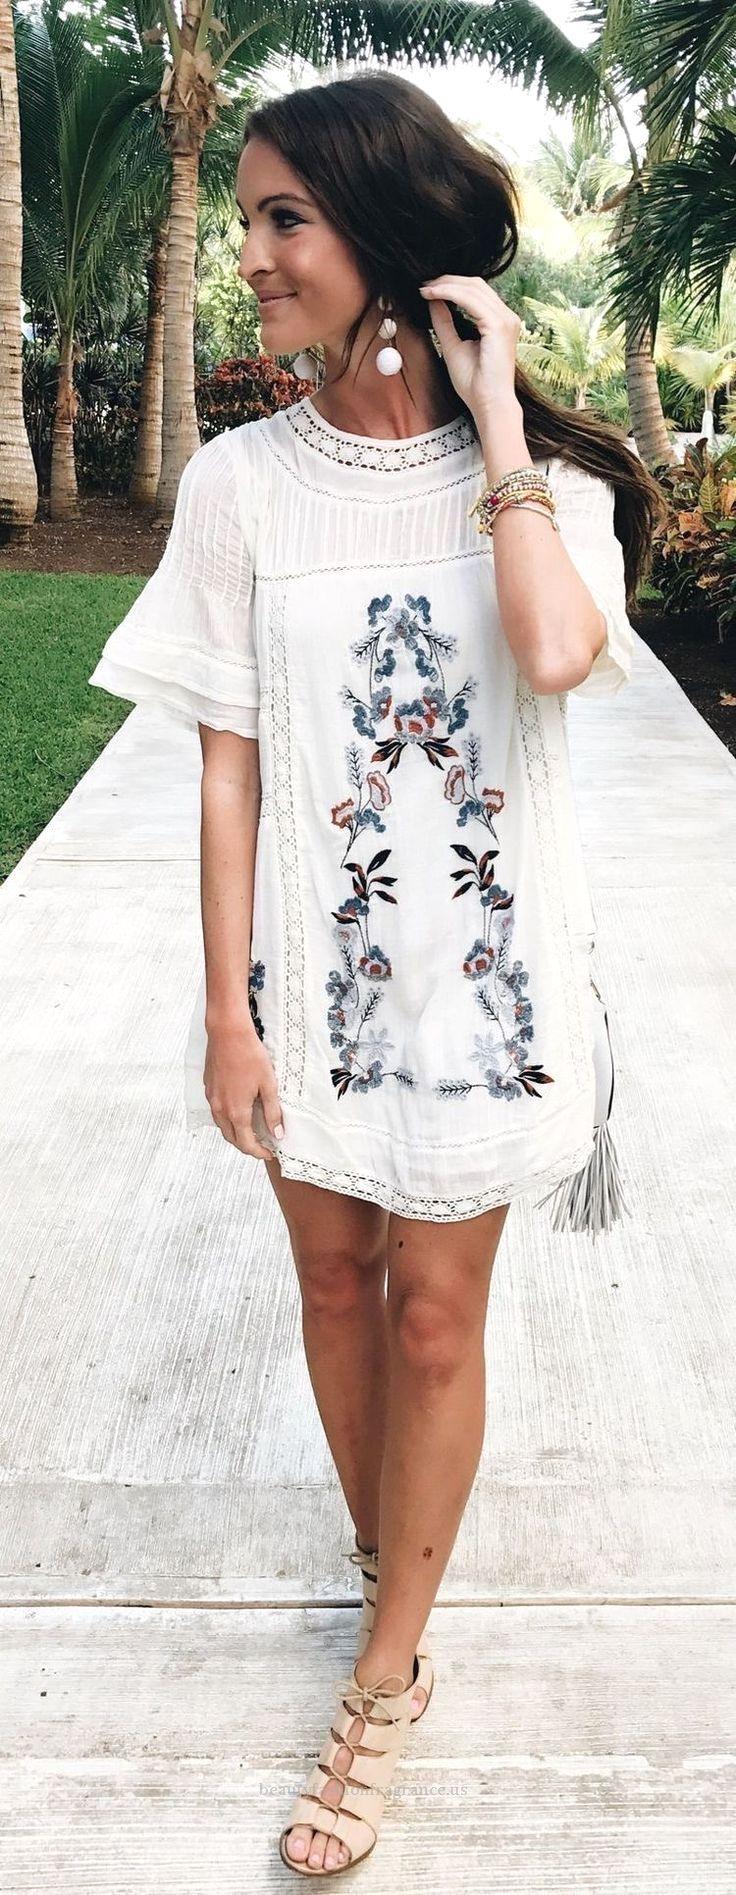 Embroidered dressu embroidered dress